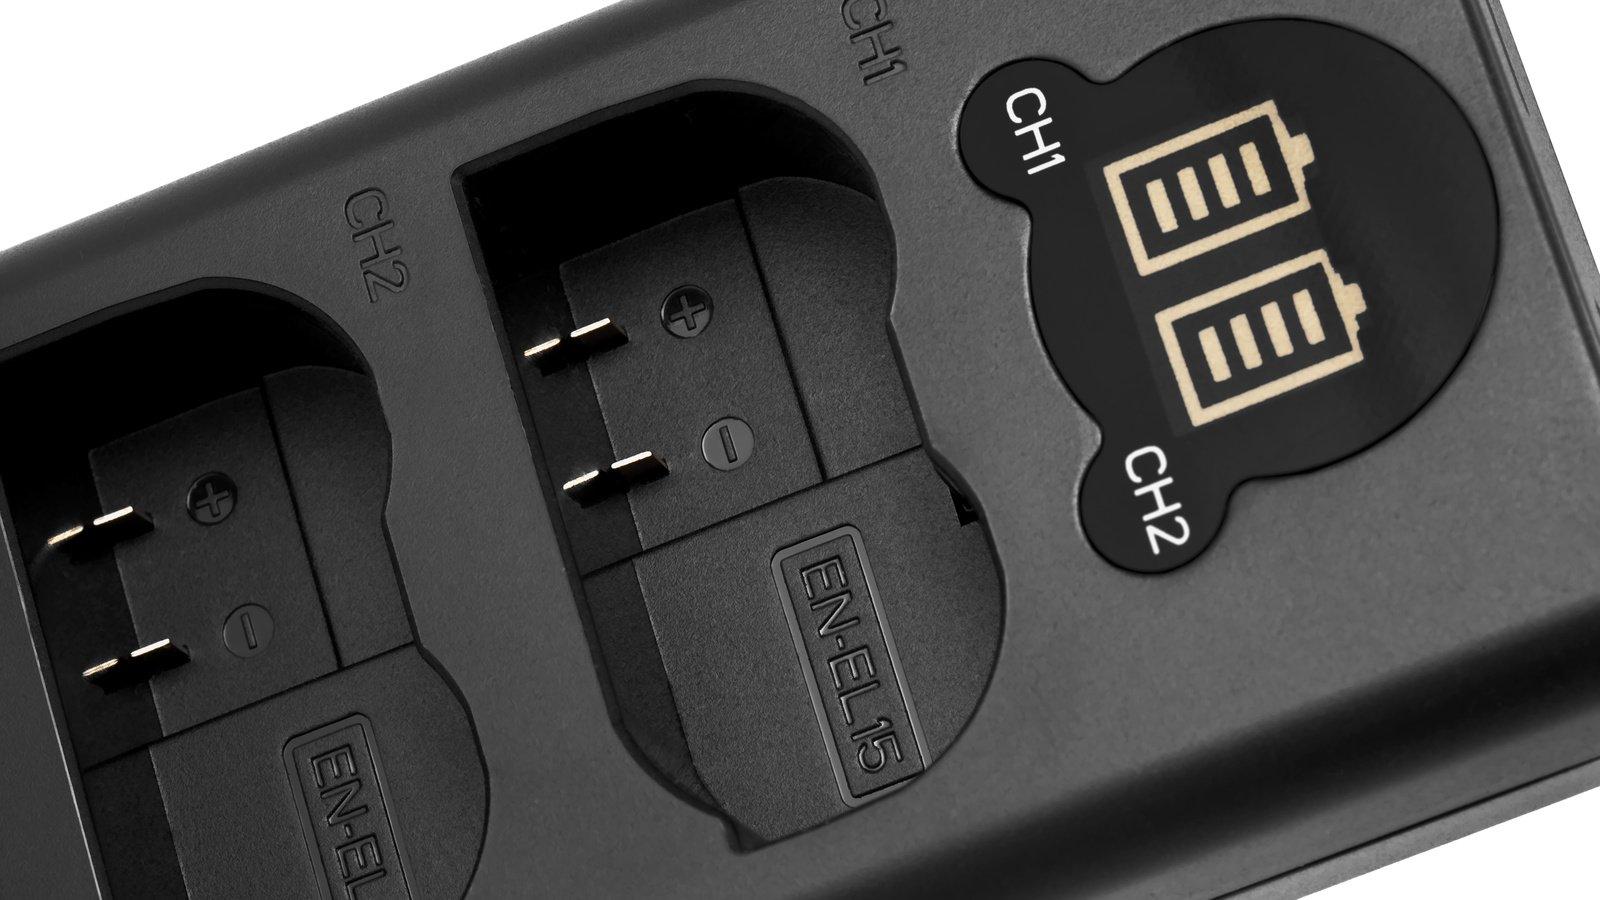 ROKO TCU2-EL15 Doppel-Ladegerät mit USB für Nikon EN-EL15 Akkus Foto Nr. 1